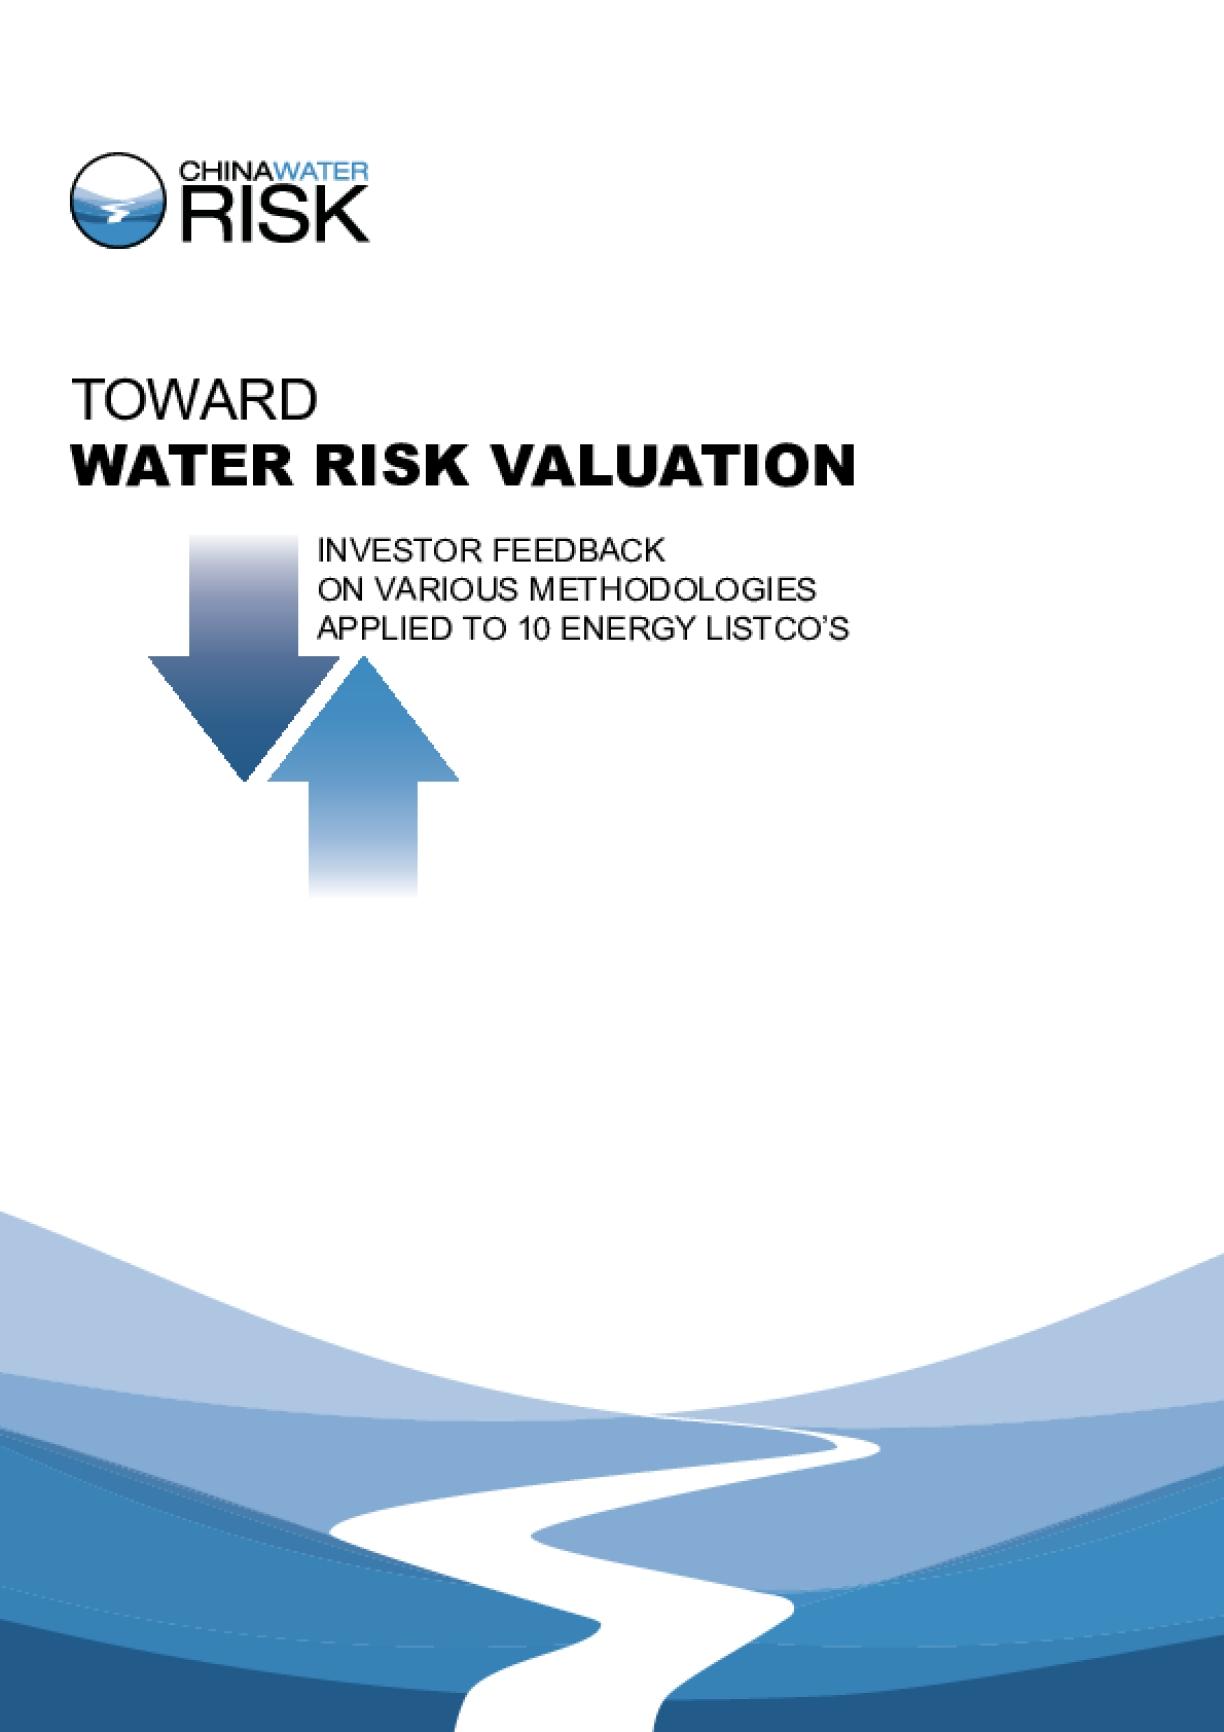 Toward Water Risk Valuation – Investor Feedback on Various Methodologies Applied to 10 Energy ListCo's